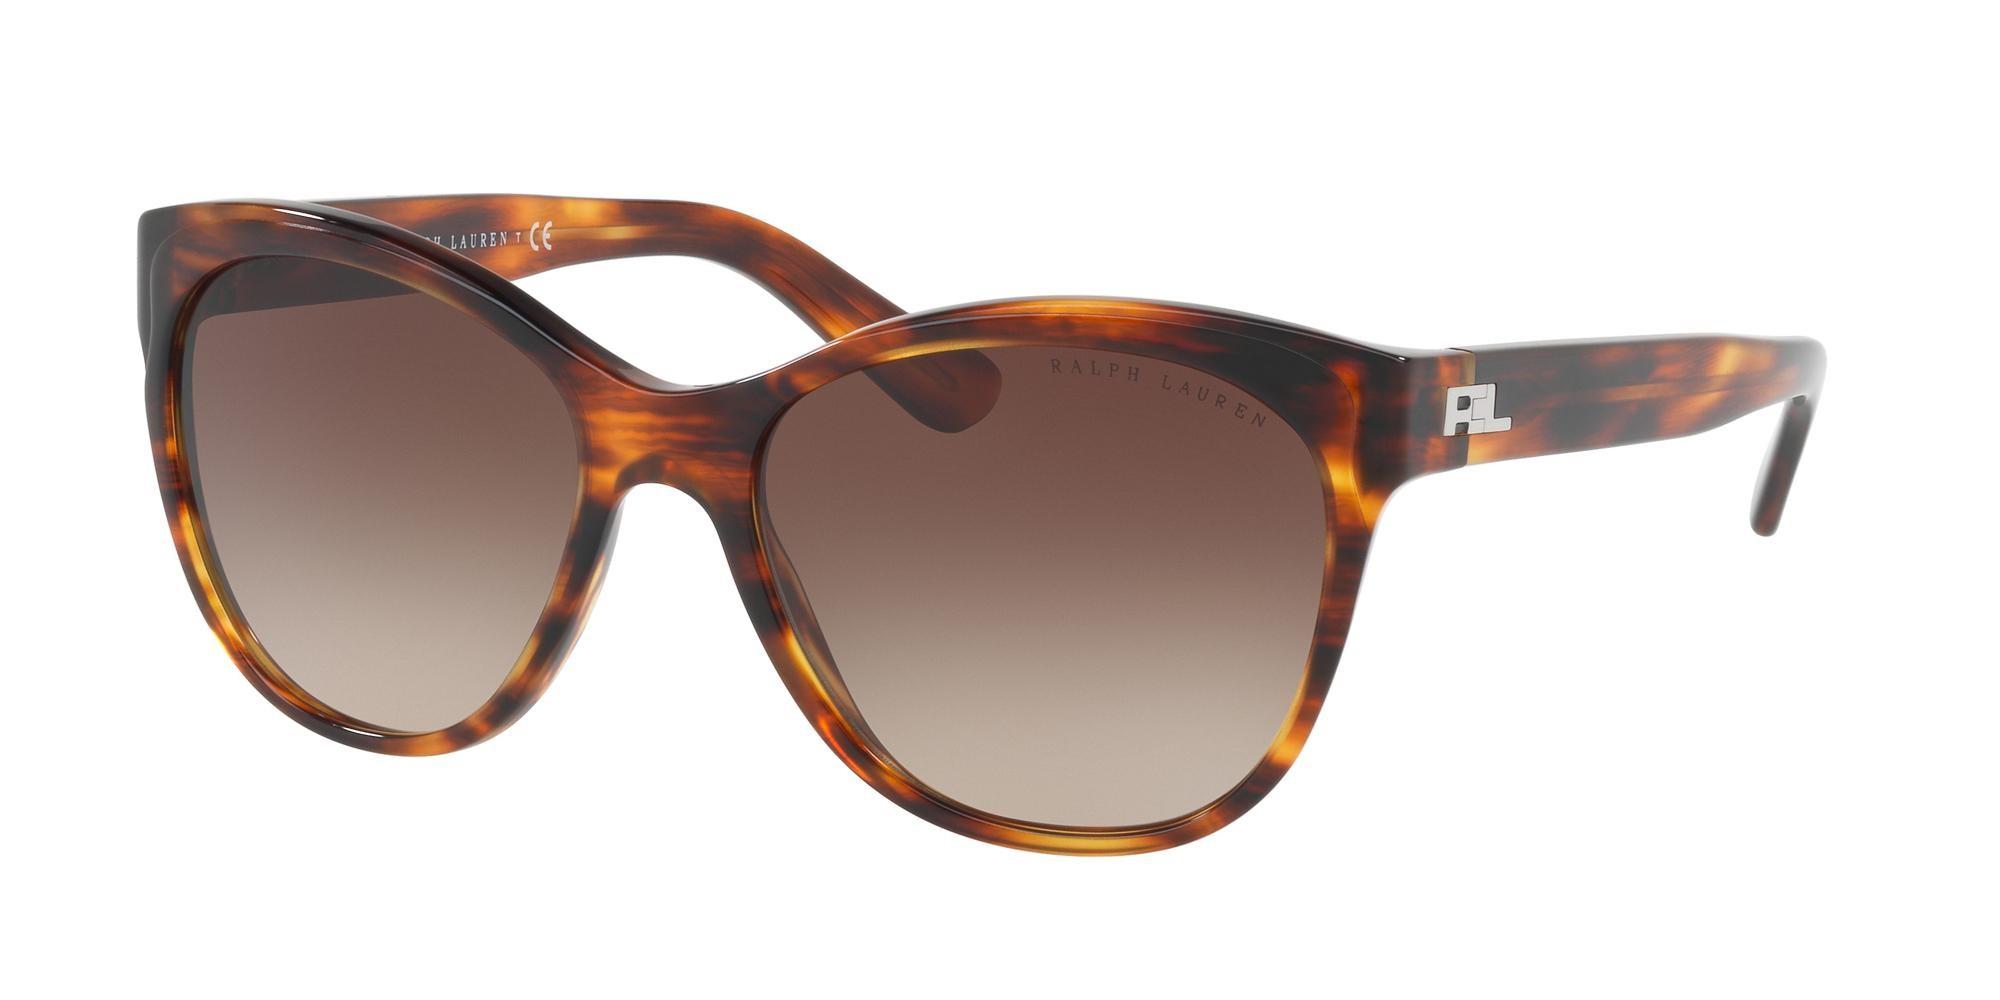 Ralph Lauren sunglasses RL 8156